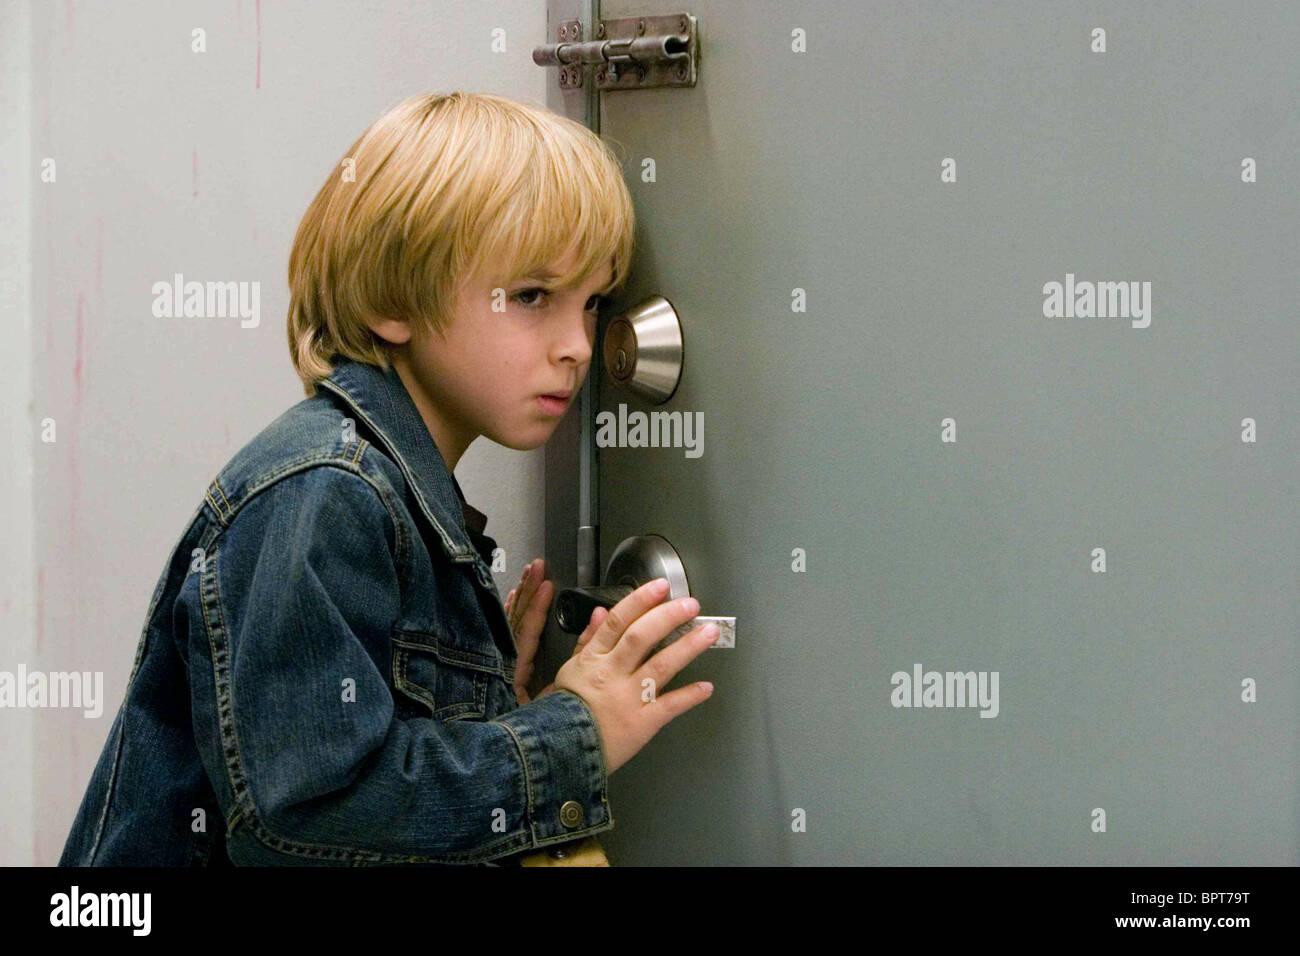 JACKSON BOND THE INVASION (2007) - Stock Image